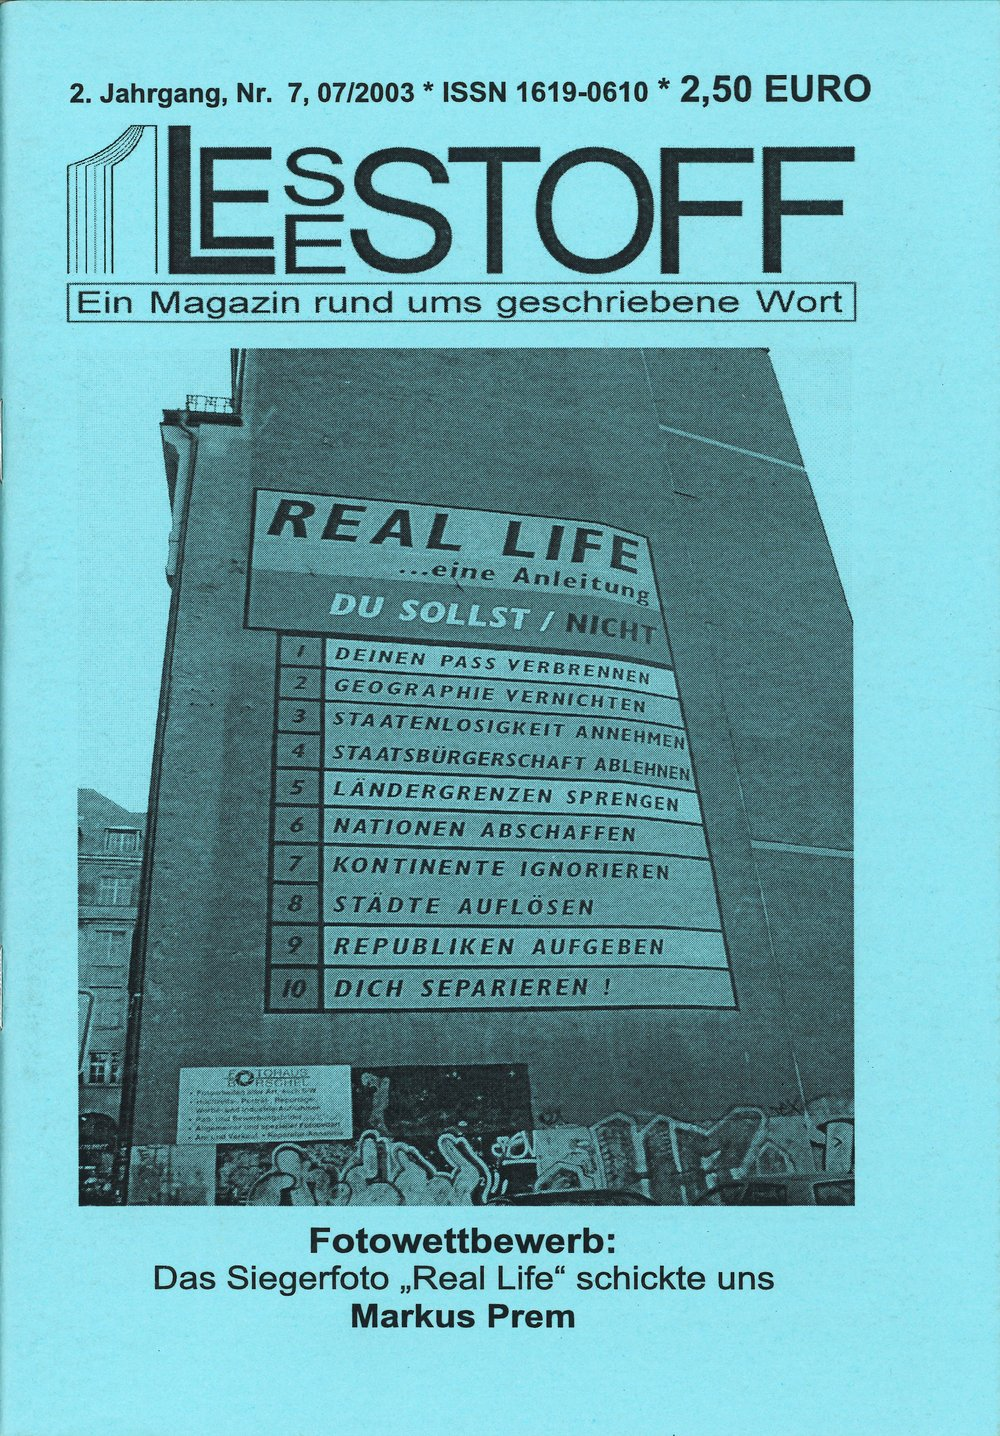 LESESTOFF_7_COVER_mini.jpg